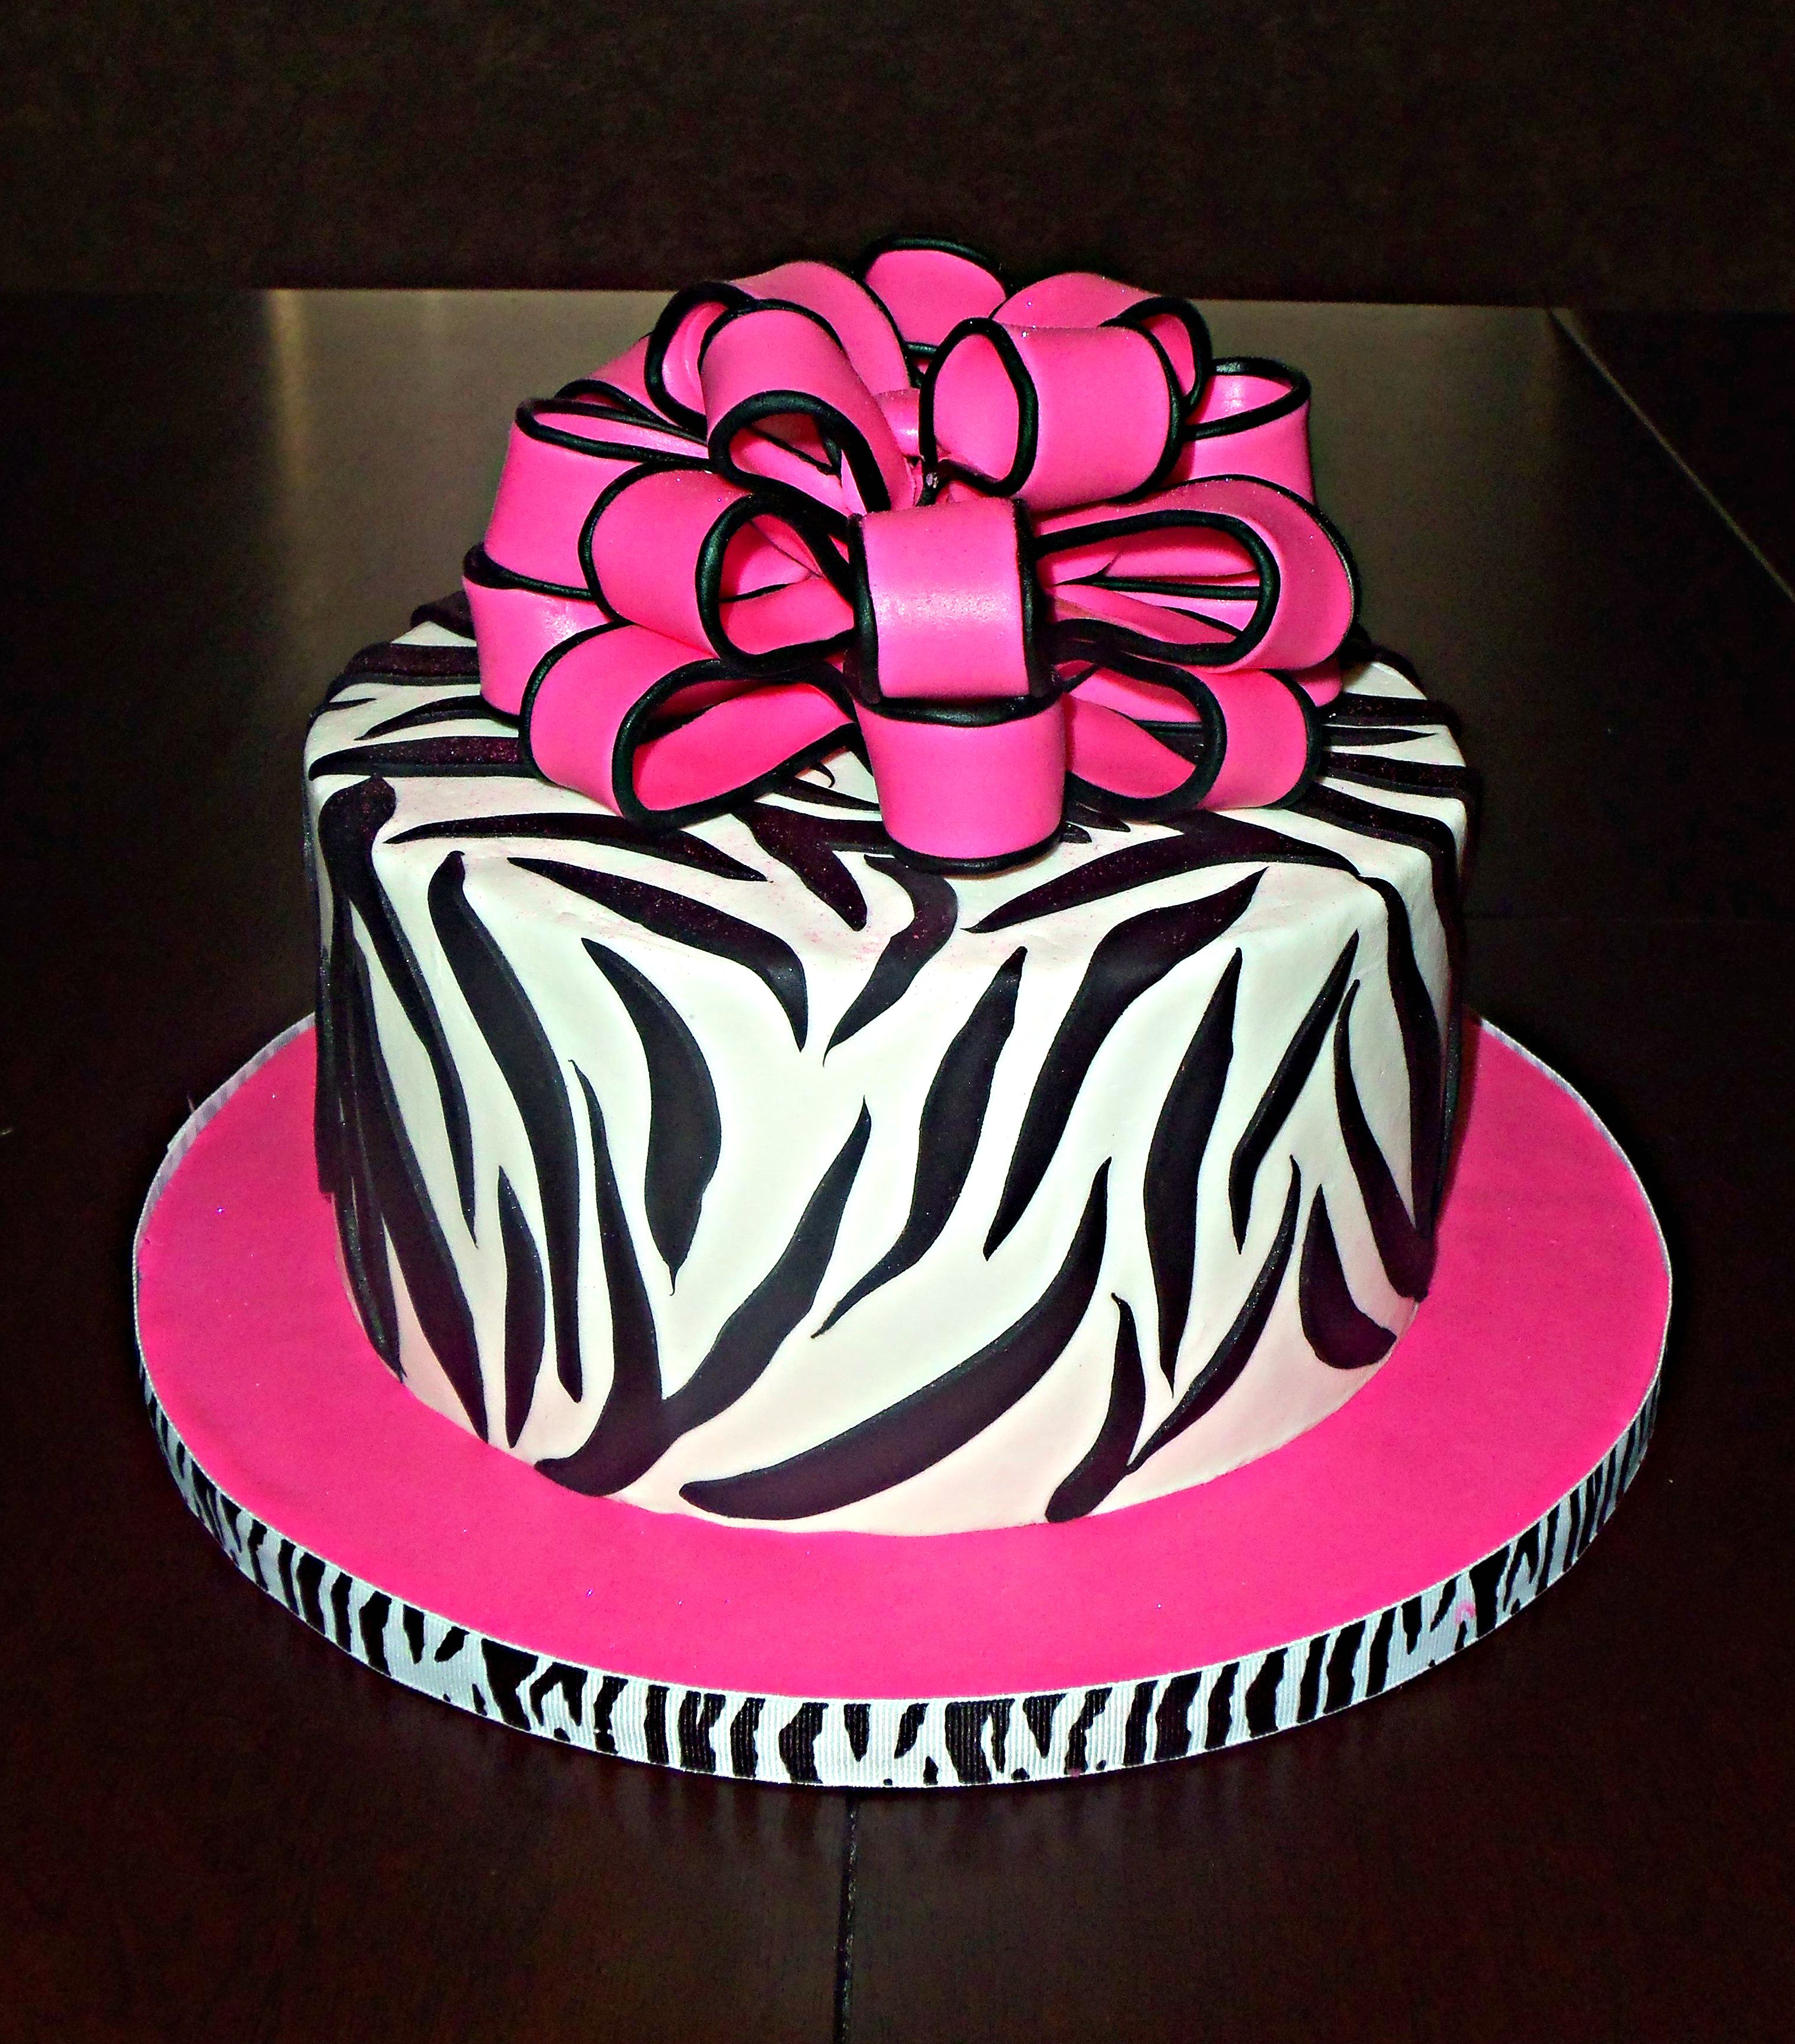 Terrific Zebra And Loopy Bow Zebra Birthday Cakes Funny Birthday Cards Online Sheoxdamsfinfo